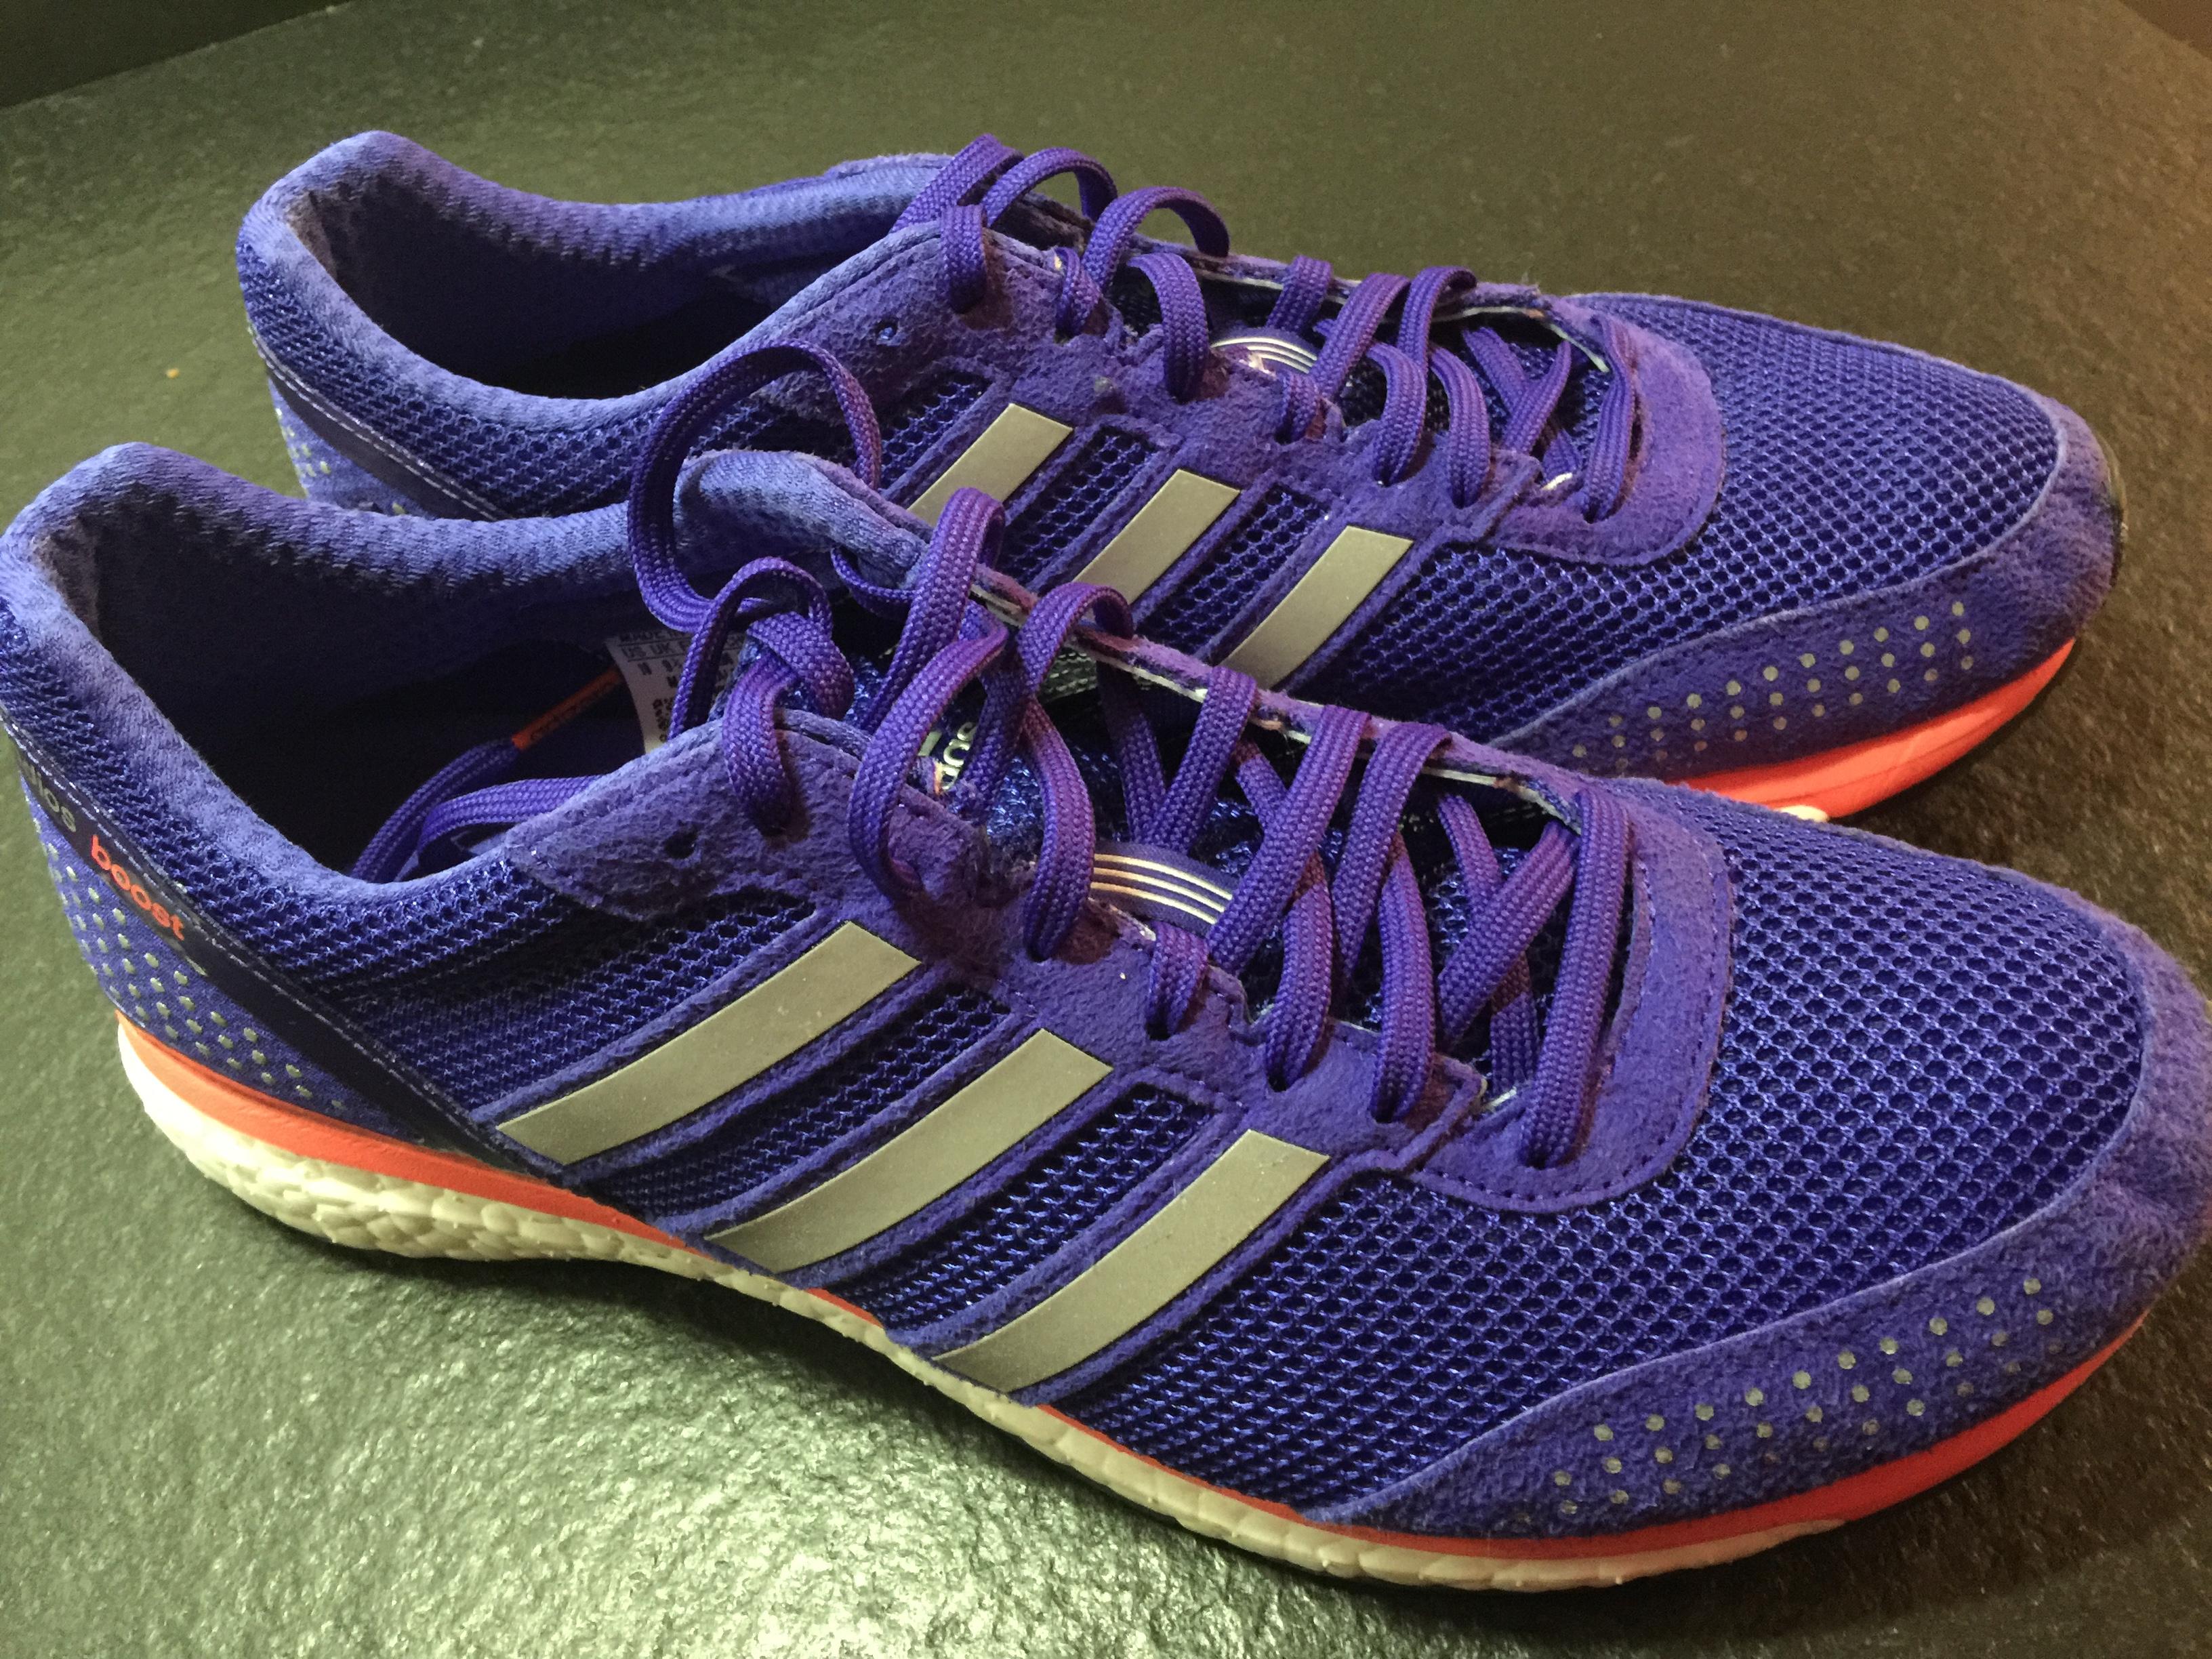 adidas boost violette